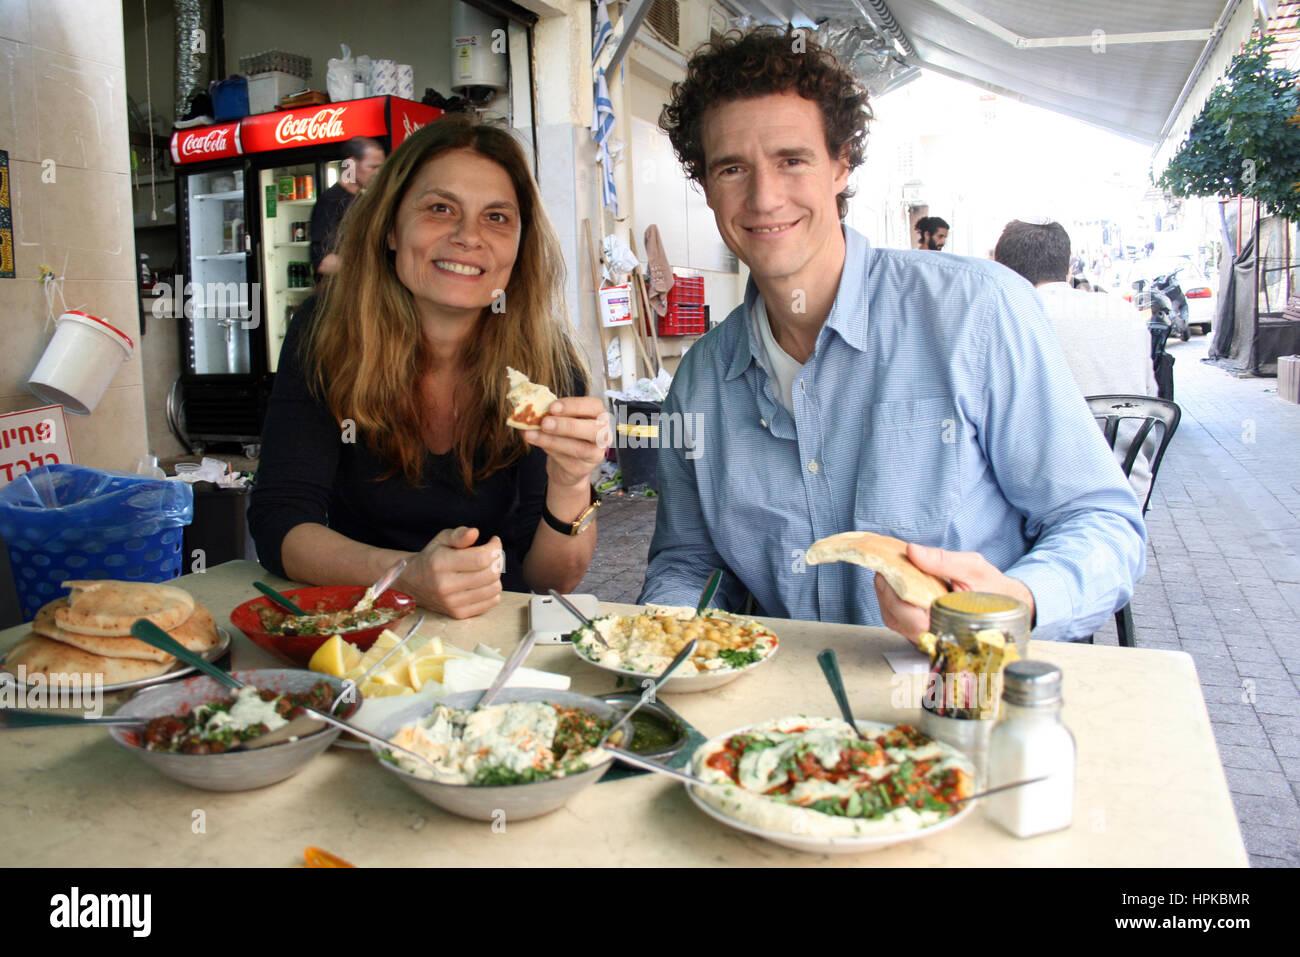 Tom Franz tel aviv 23rd feb 2017 austrian tv chef wiener and